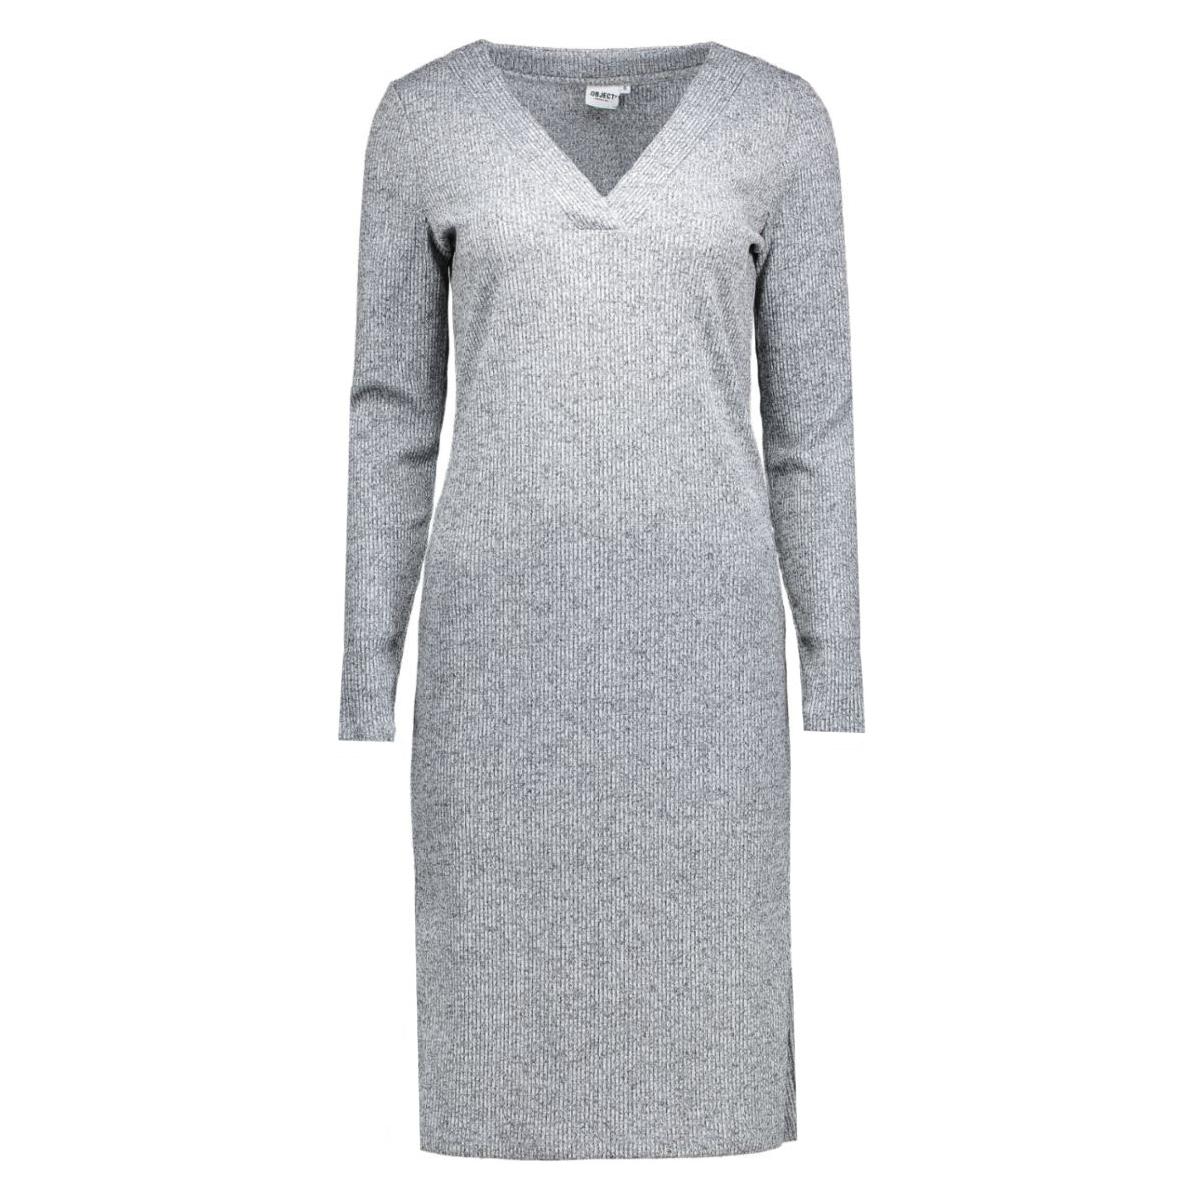 objtrish l/s long dress 87 23023084 object jurk medium grey melange